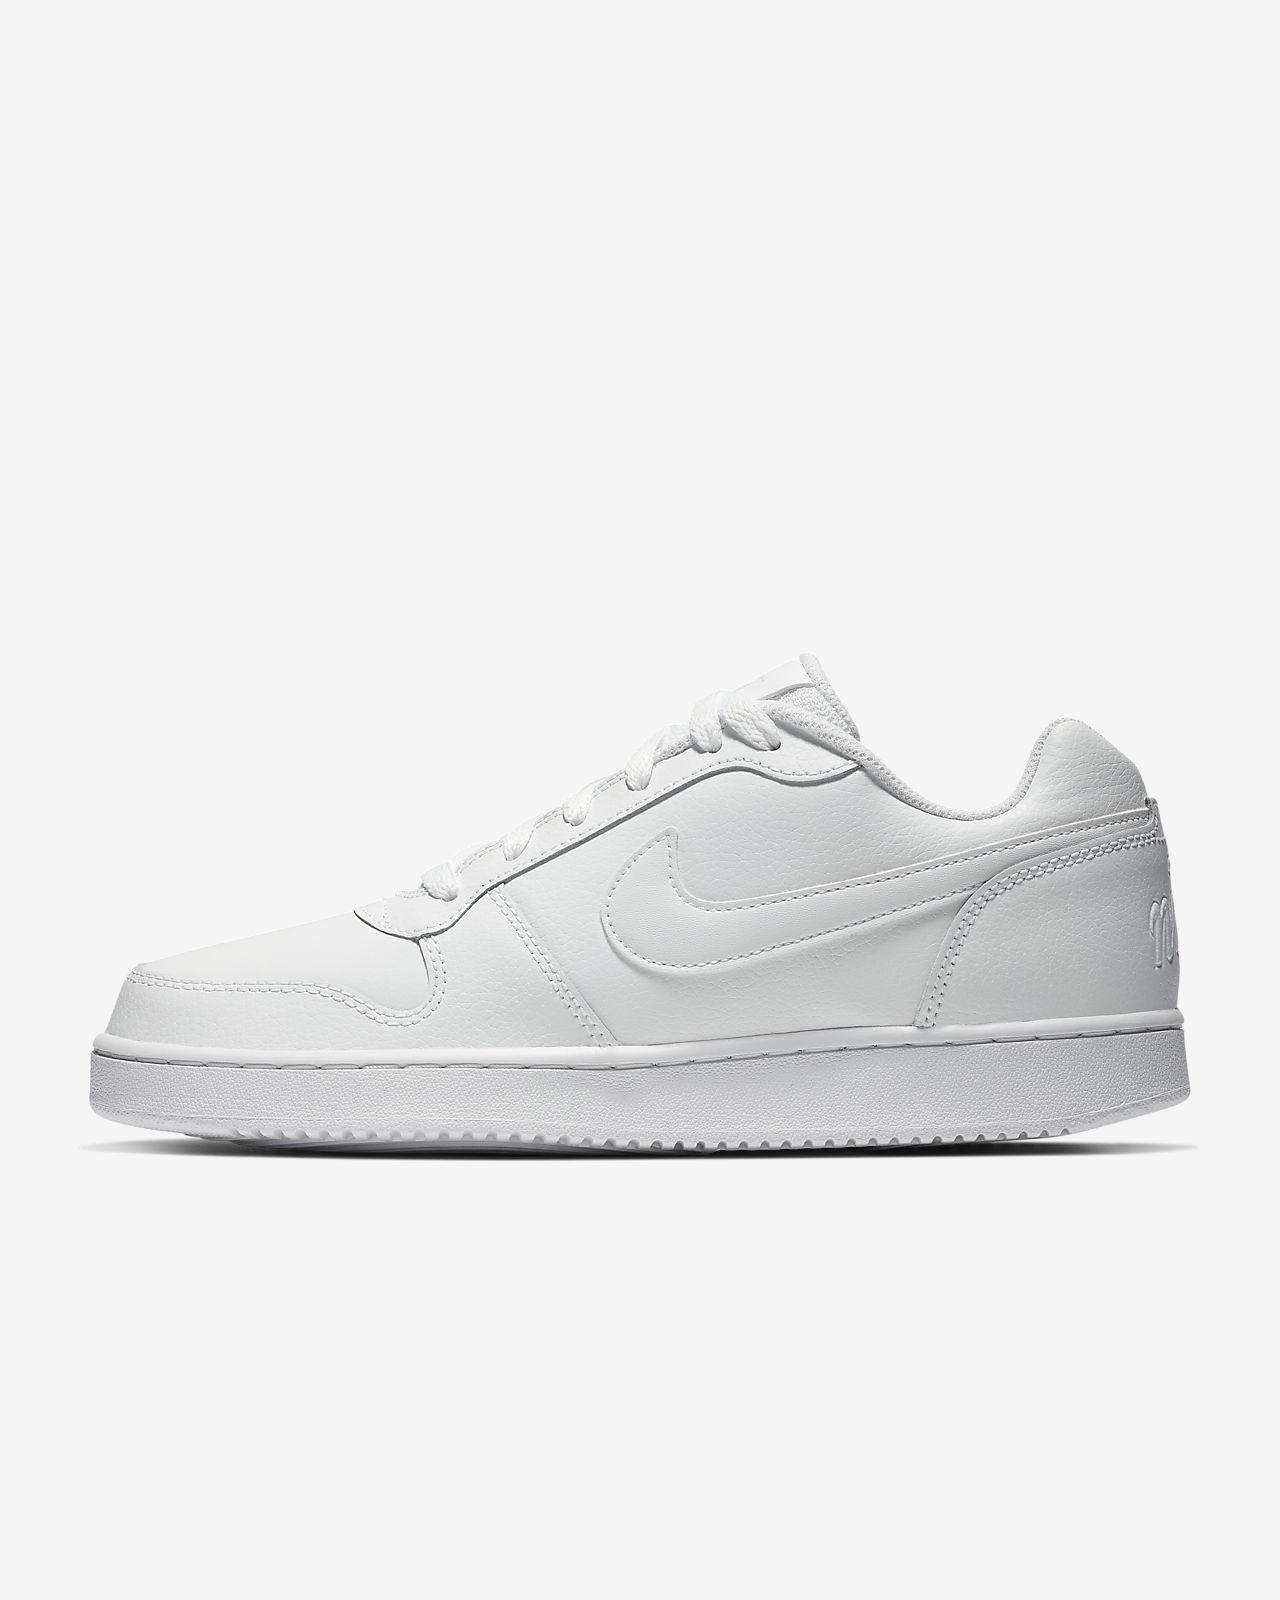 Nike Ebernon Low Damesschoen